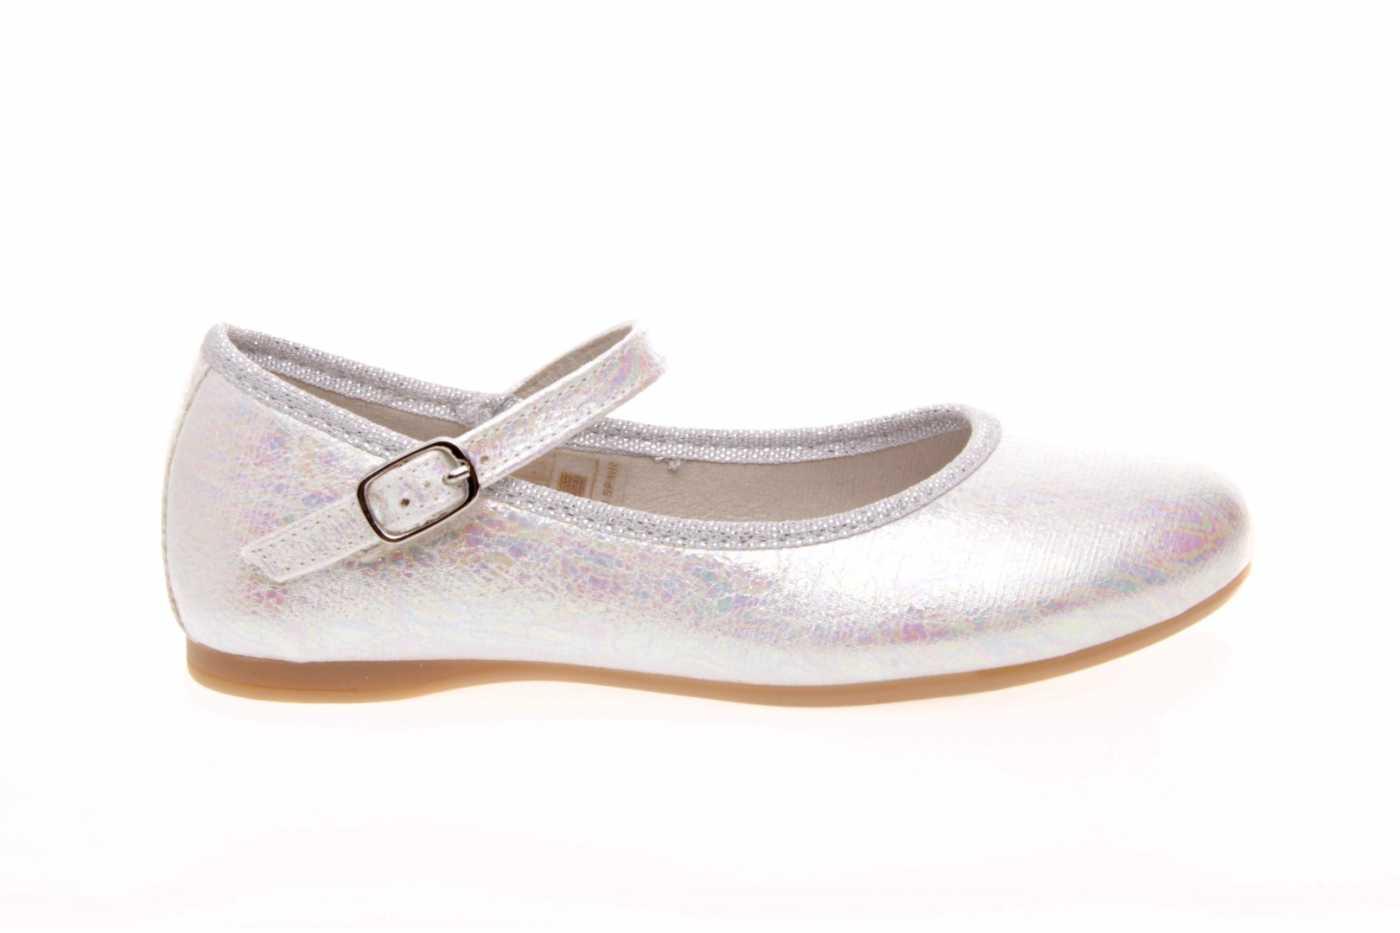 63bc3452 Comprar zapato tipo JOVEN NIÑA estilo MERCEDES COLOR PLATA CHAROL ...